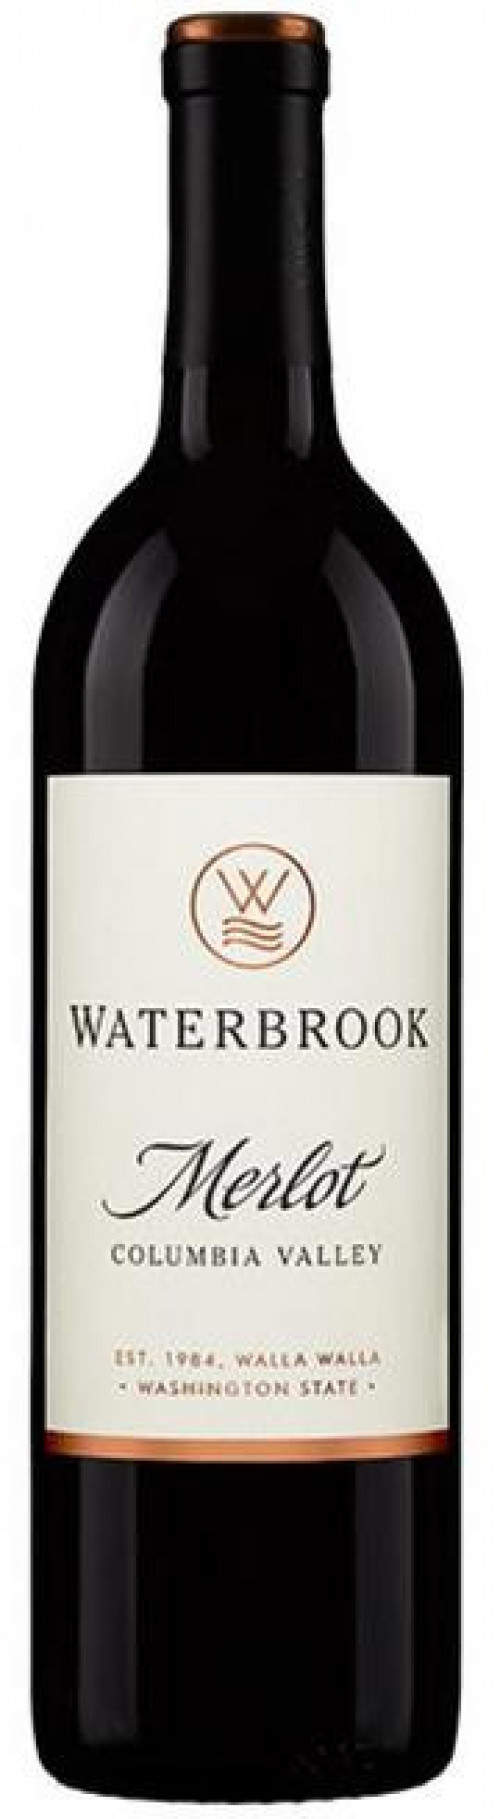 Waterbrook Merlot 750ml